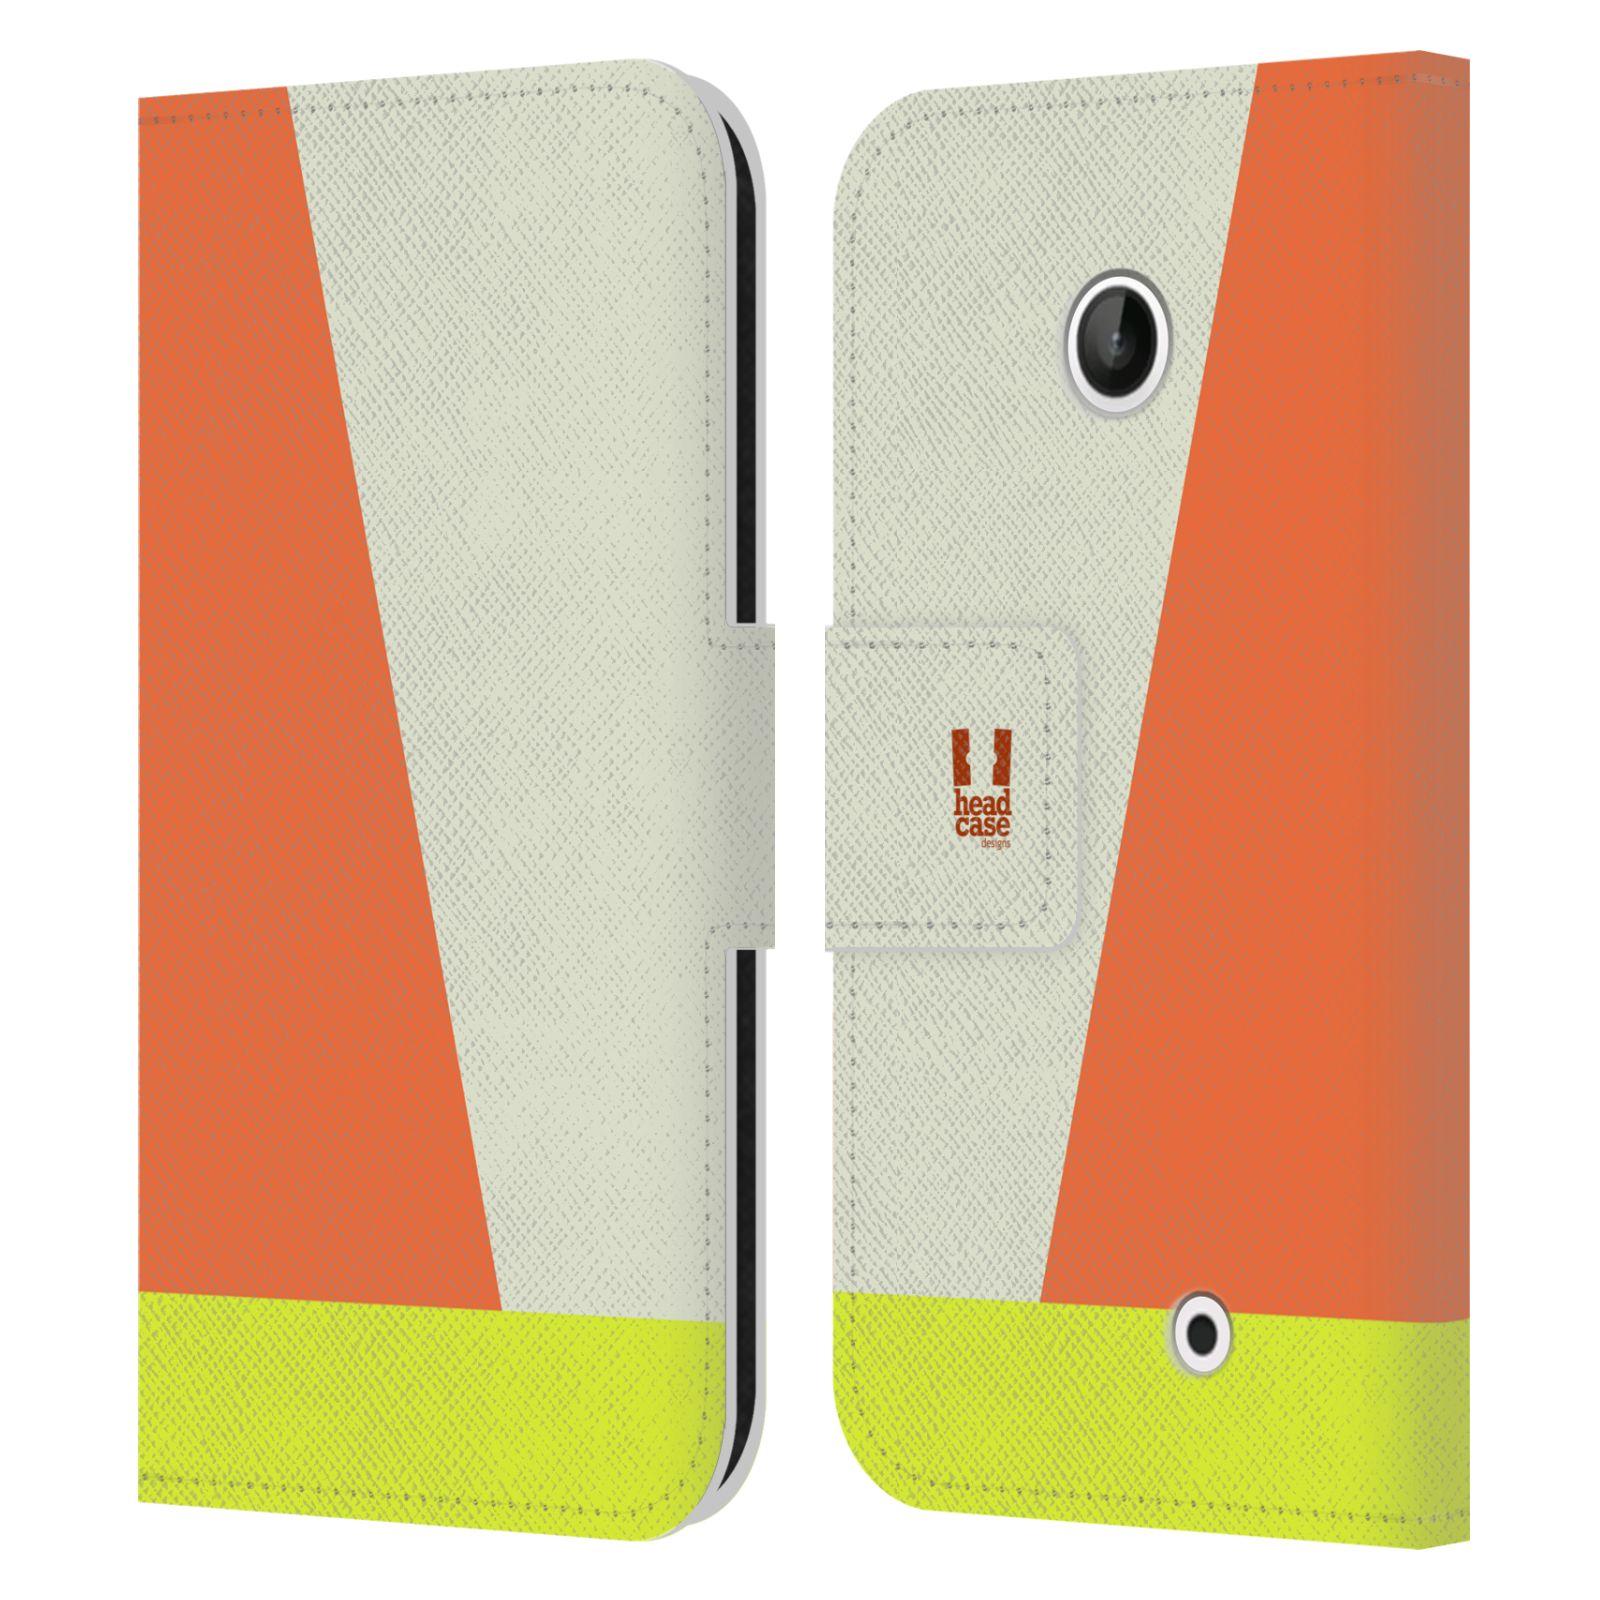 HEAD CASE Flipové pouzdro pro mobil Nokia LUMIA 630/630 DUAL barevné tvary slonová kost